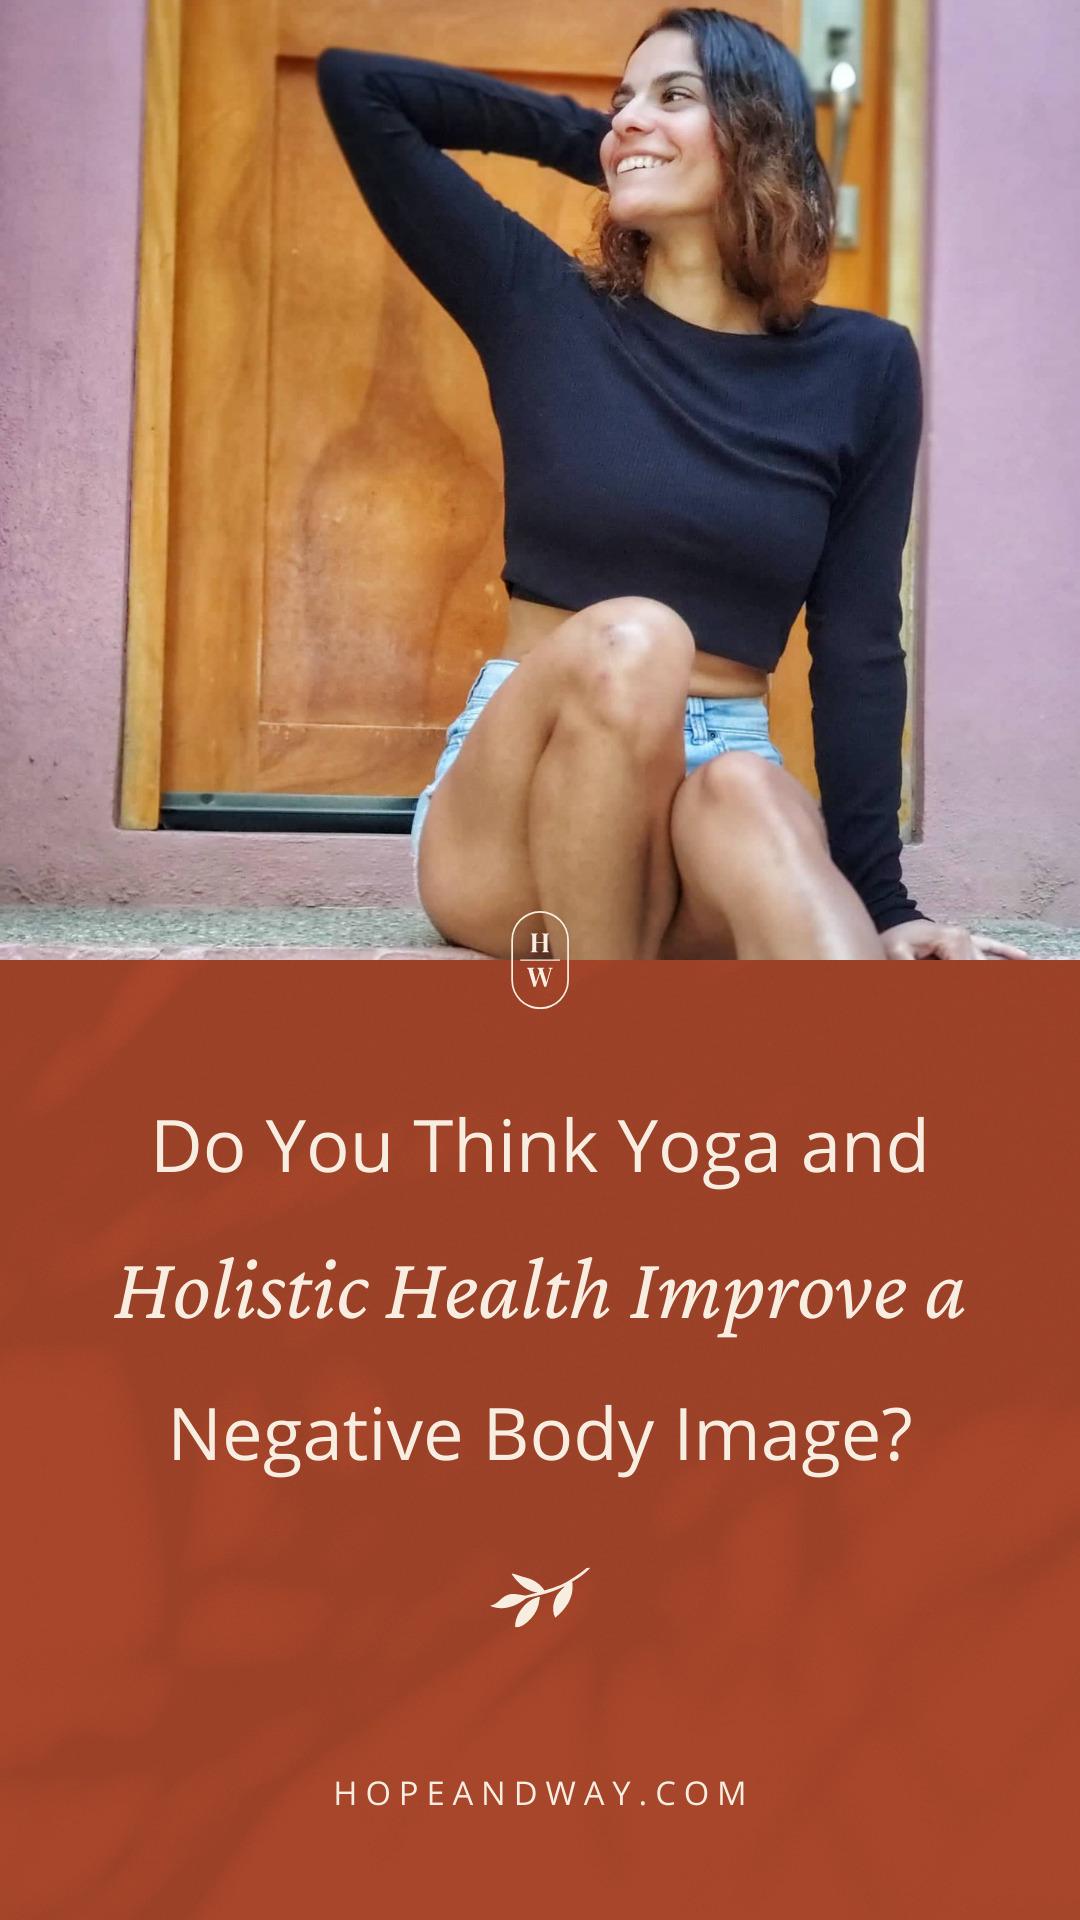 Do You Think Yoga and Holistic Health Improve a Negative Body Image? Interview with Lencha Nastova